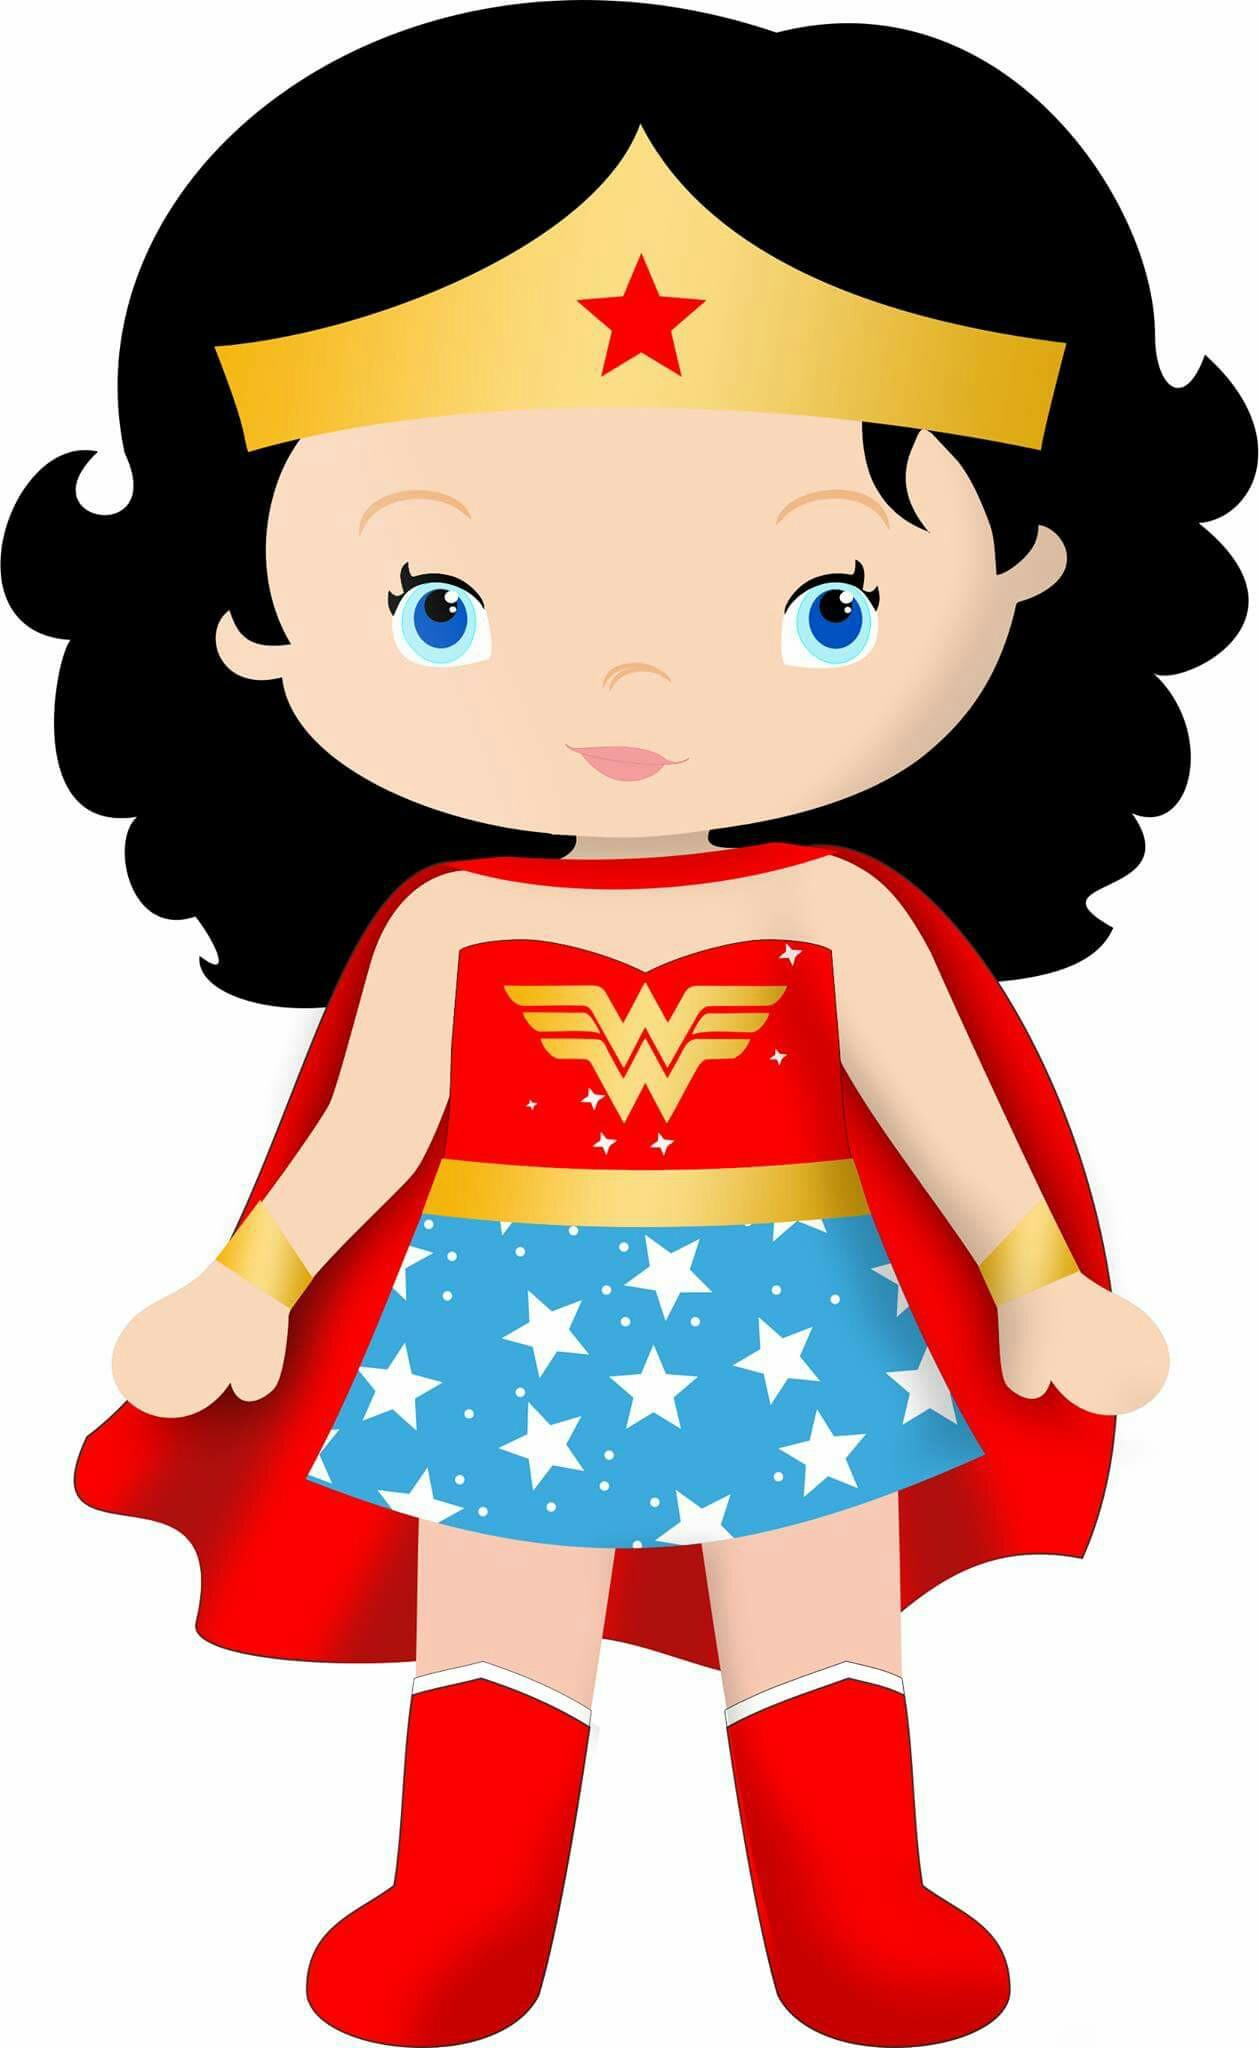 Wonder woman tiara clipart banner black and white Women Superhero Cliparts | Free download best Women ... banner black and white